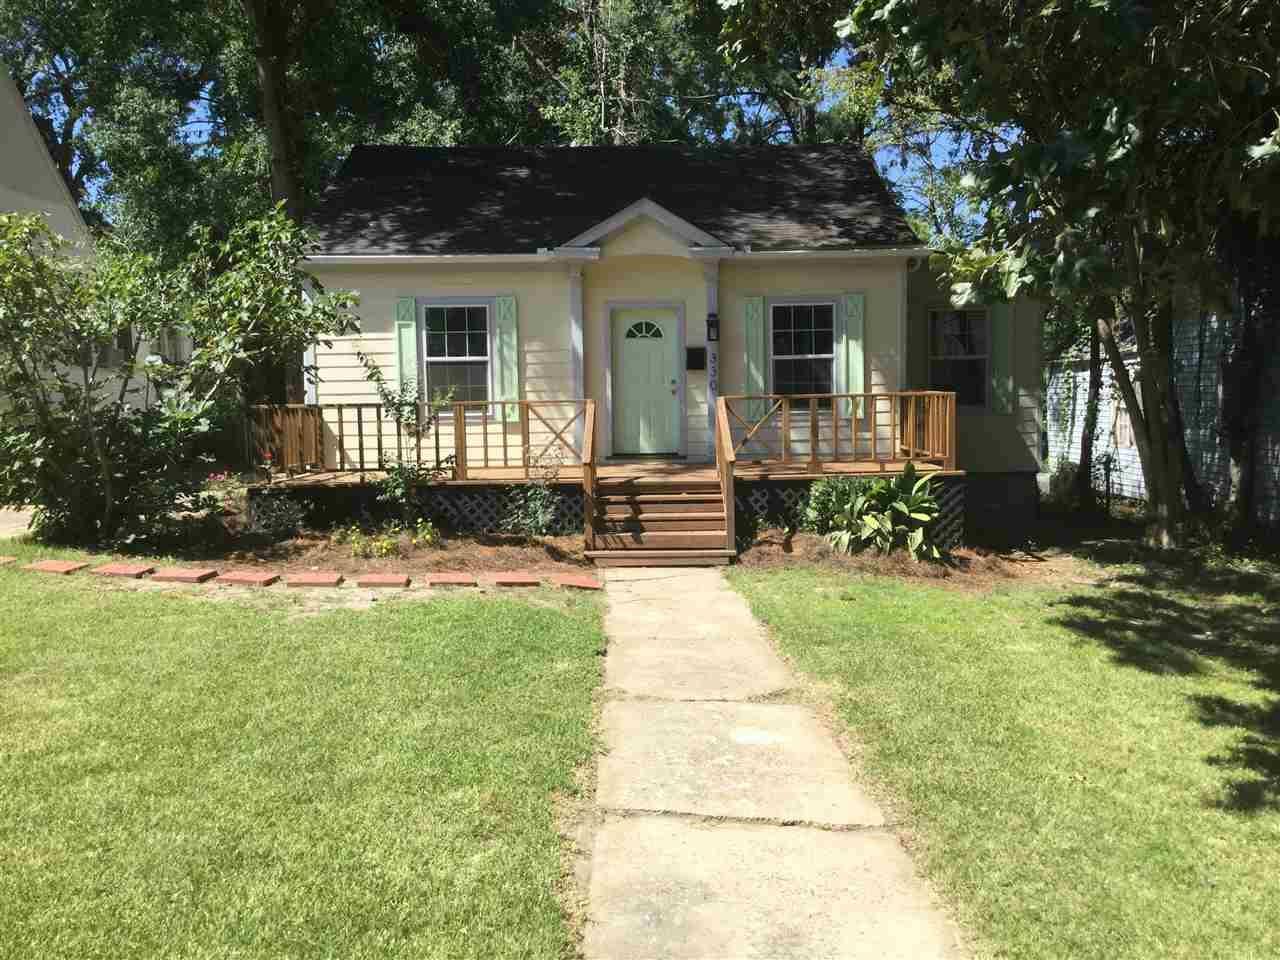 330 E MAYES ST, Jackson, MS 39206 - MLS#: 333306